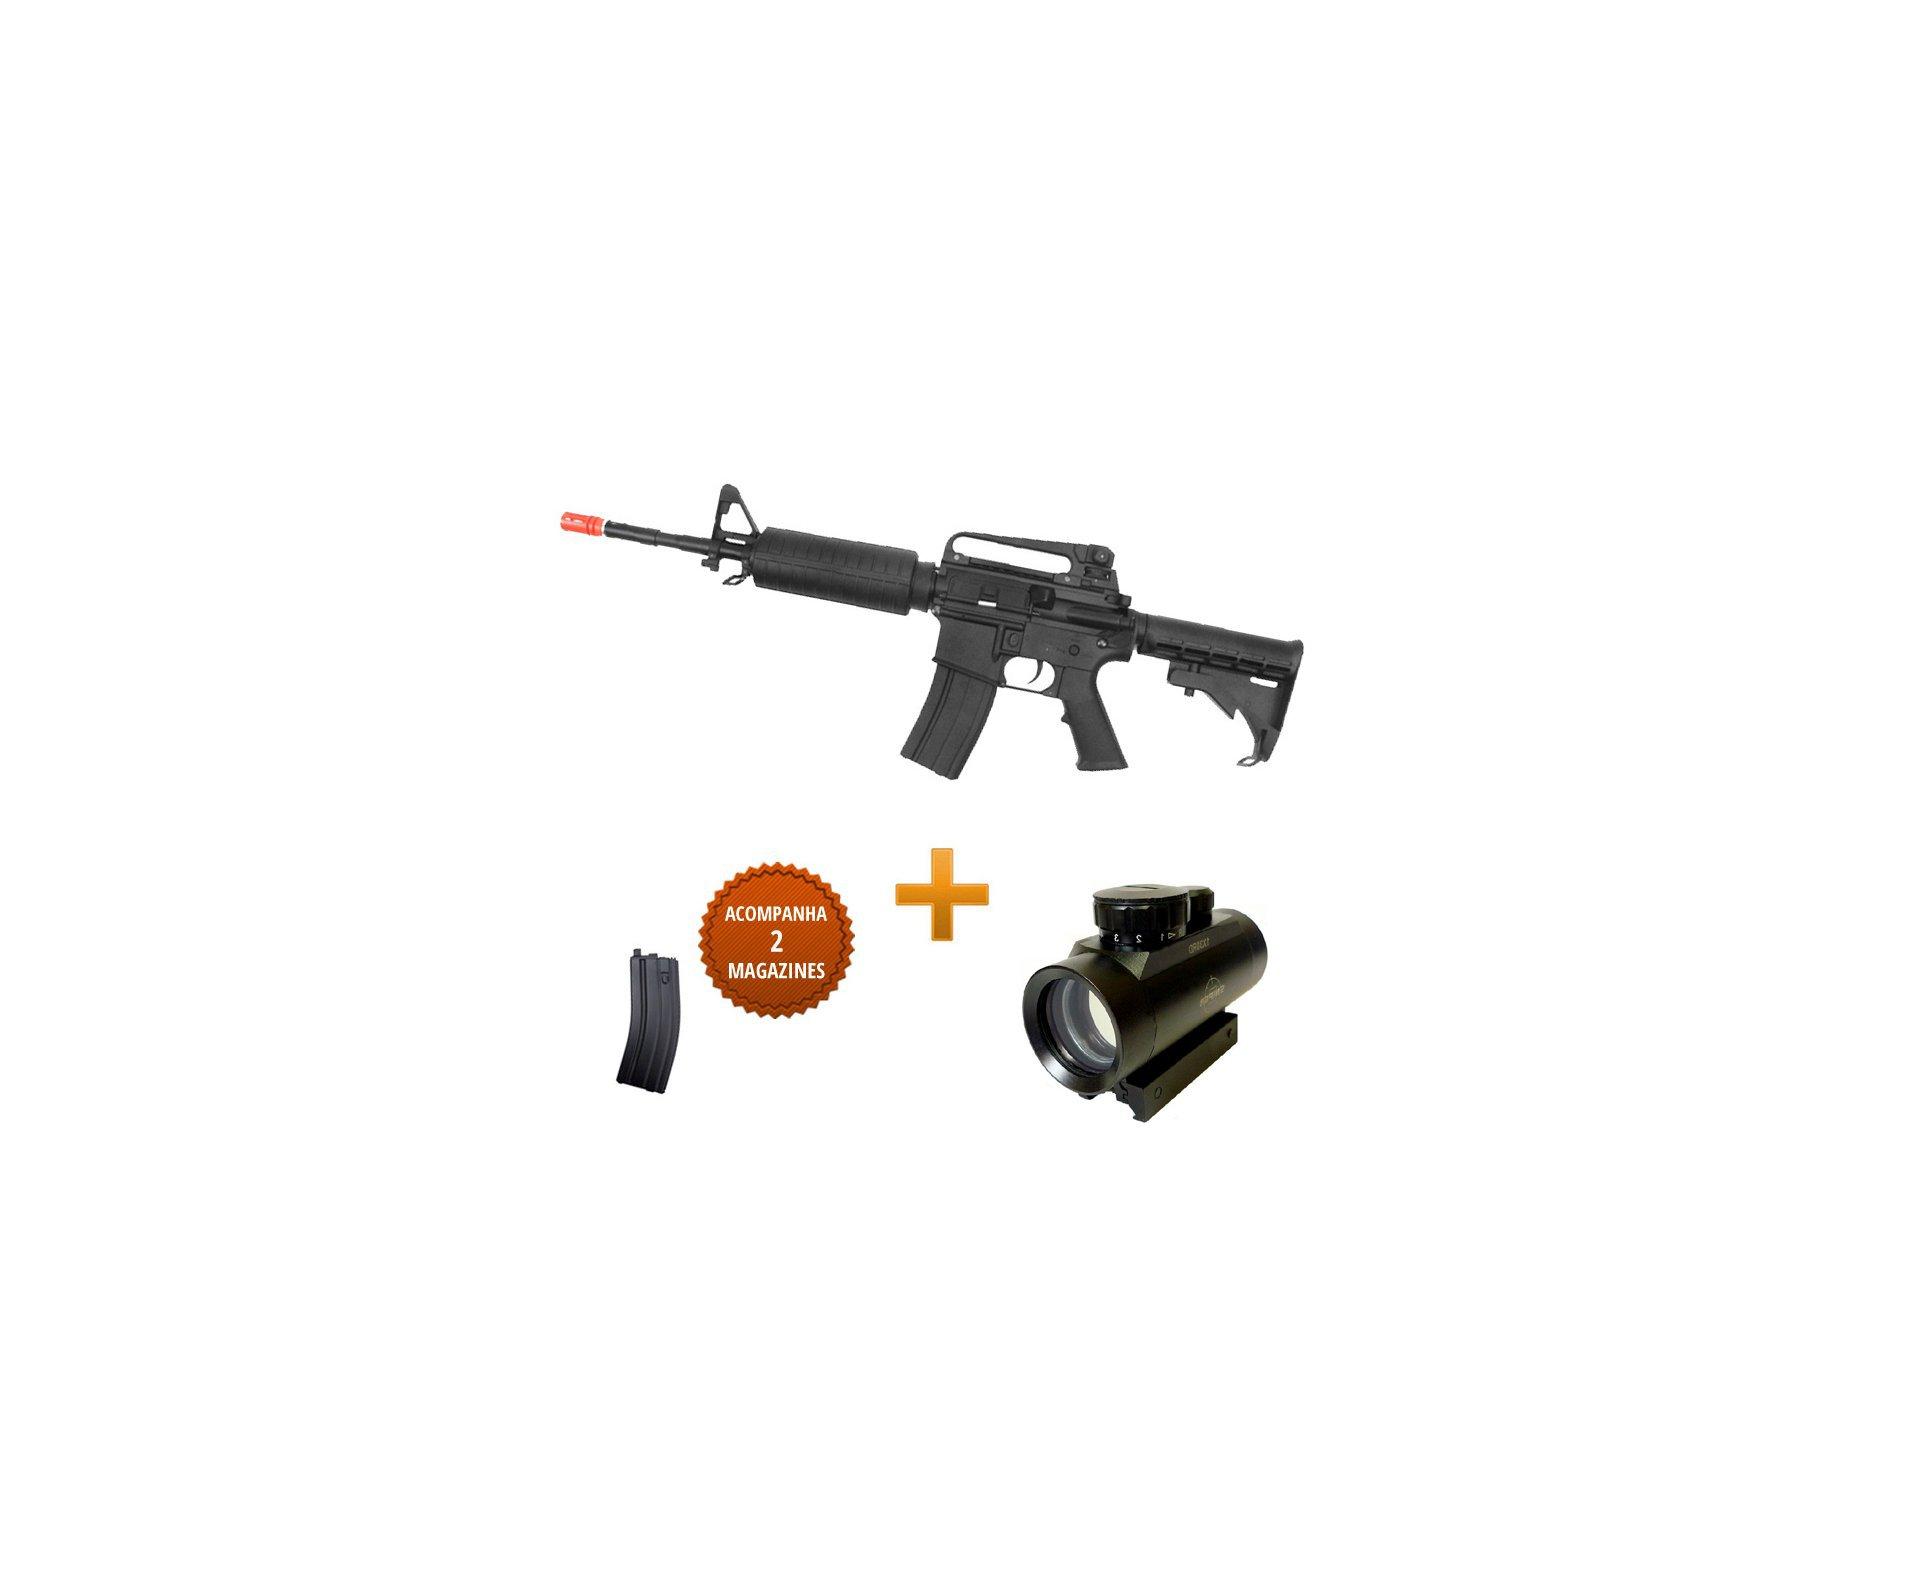 Rifle De Airsoft Colt M4a1 Carbine - Elétrico - Cal 6,0 Mm (cyber Gun) + Red Dot 1x30eg 22mm